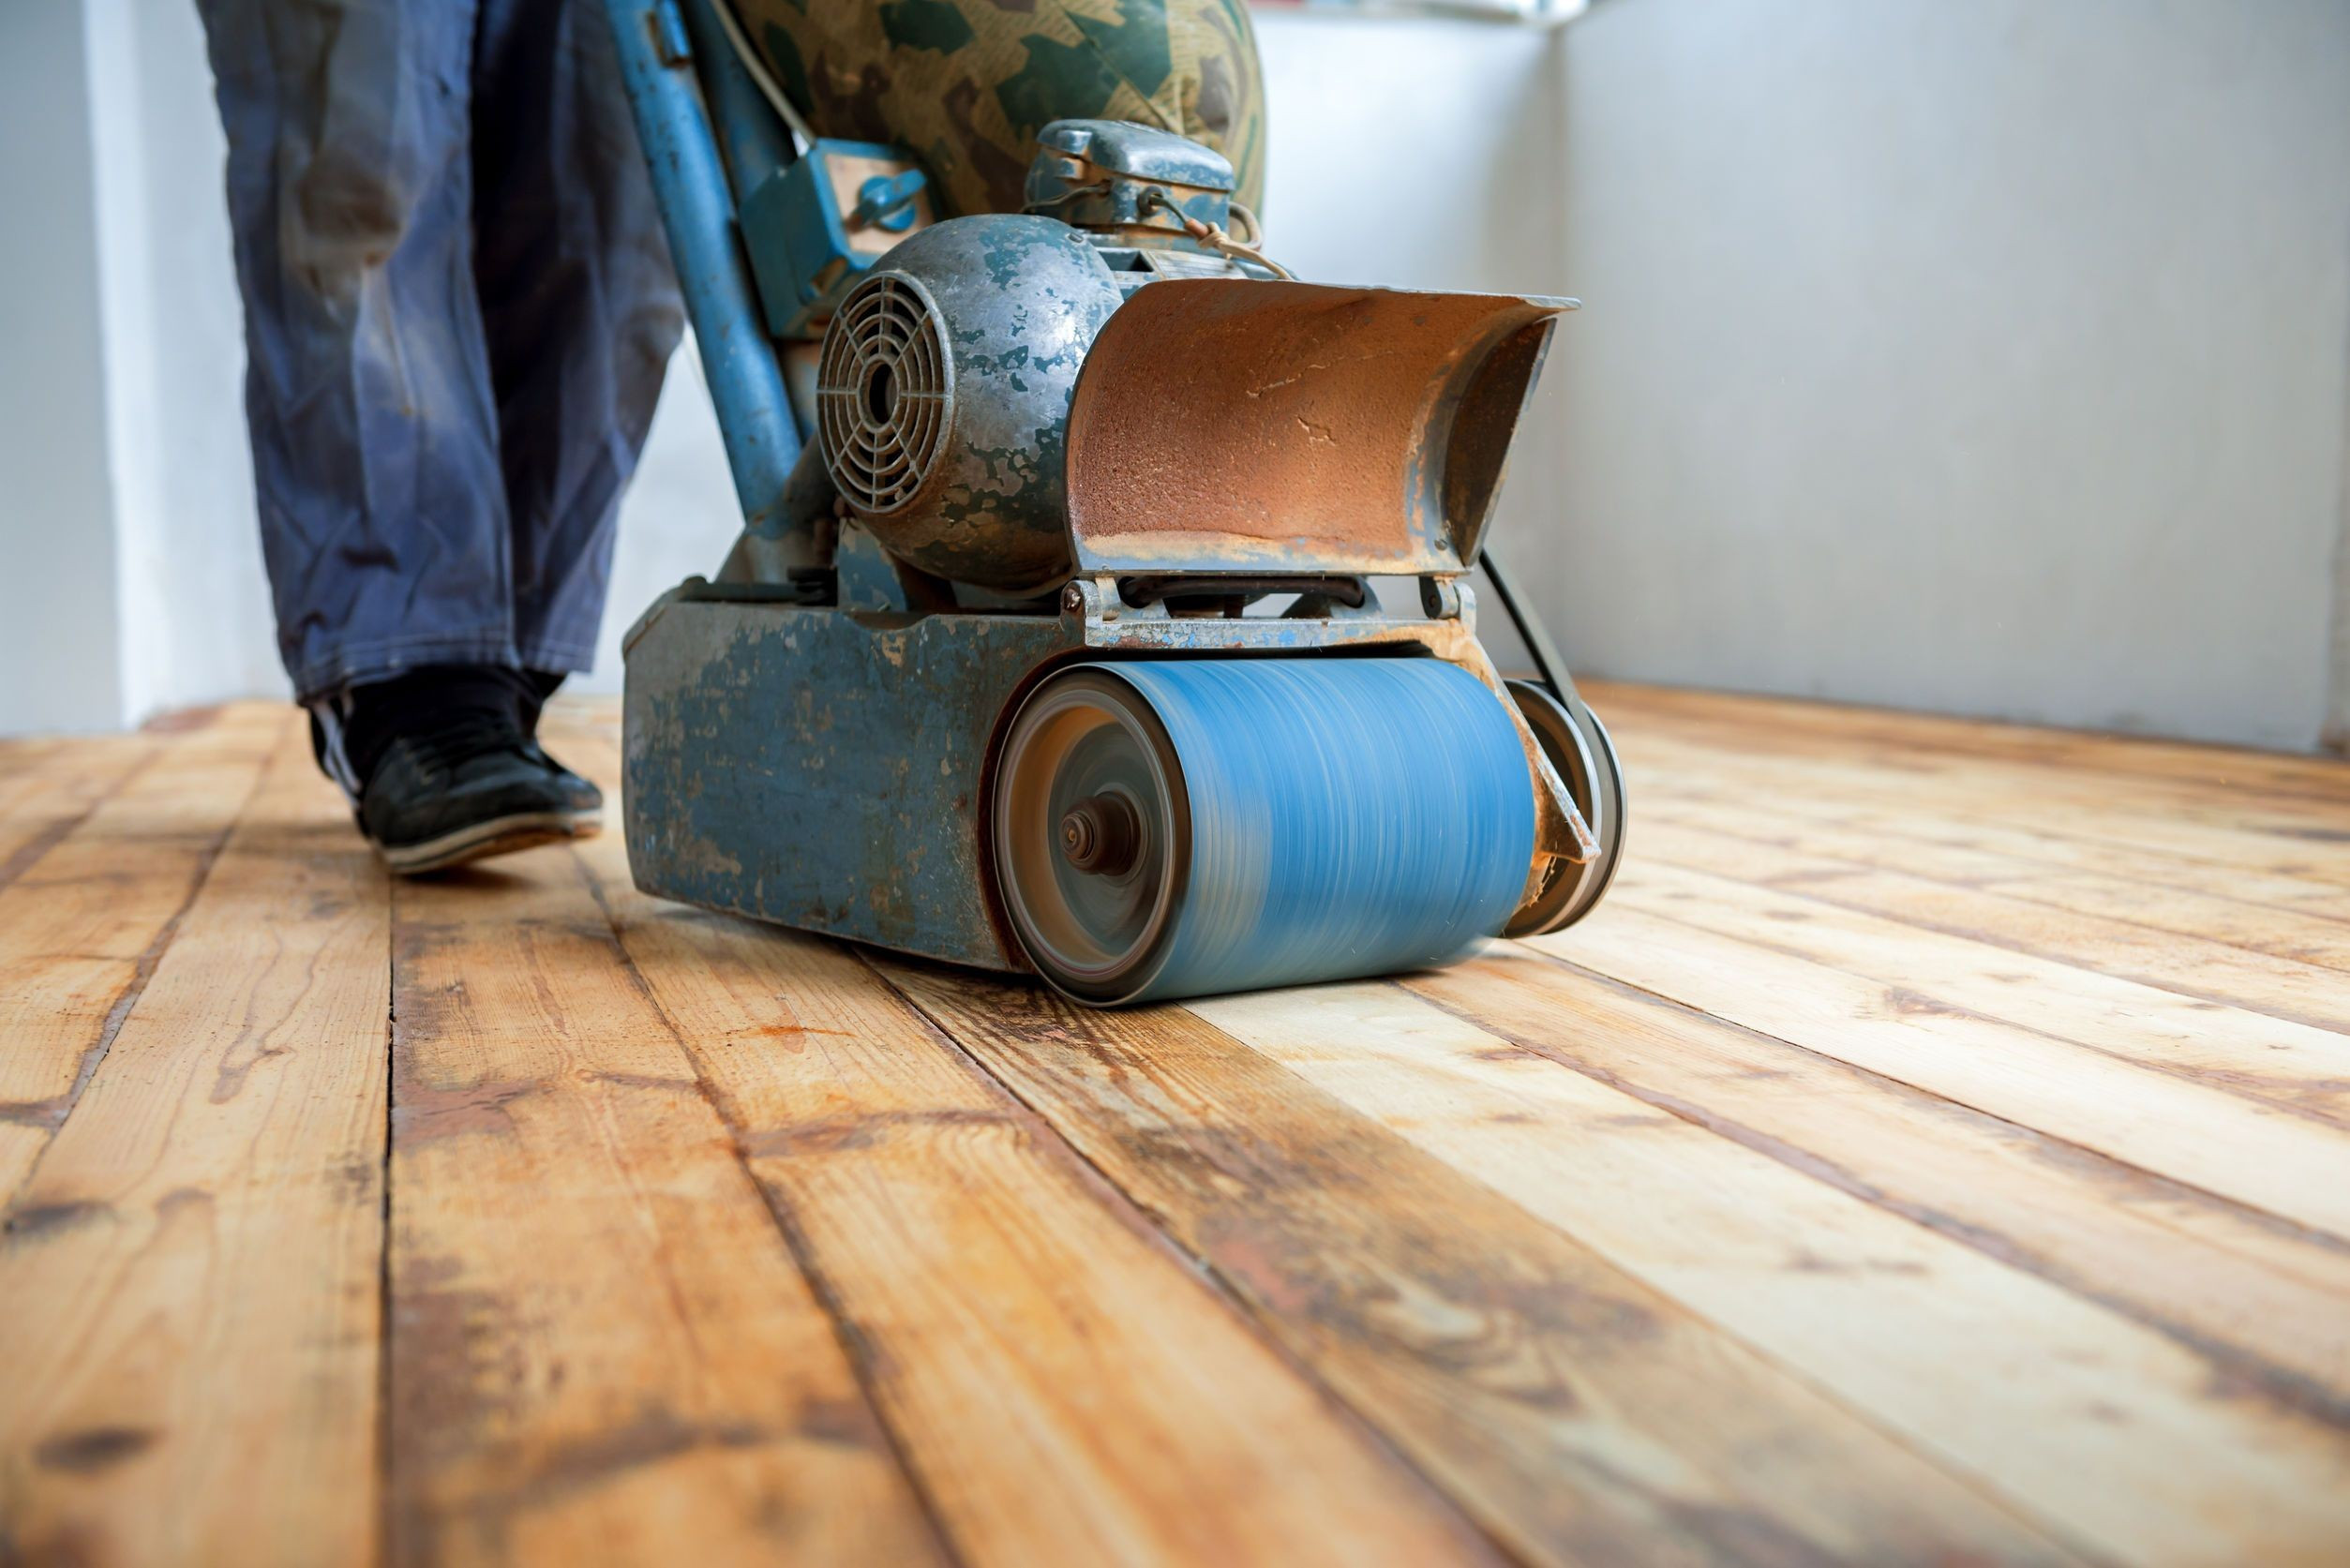 hardwood floor adhesive of how to sand hardwood floors with orbital sander 25 lovely s how to with how to sand hardwood floors with orbital sander 25 lovely s how to sand and refinish